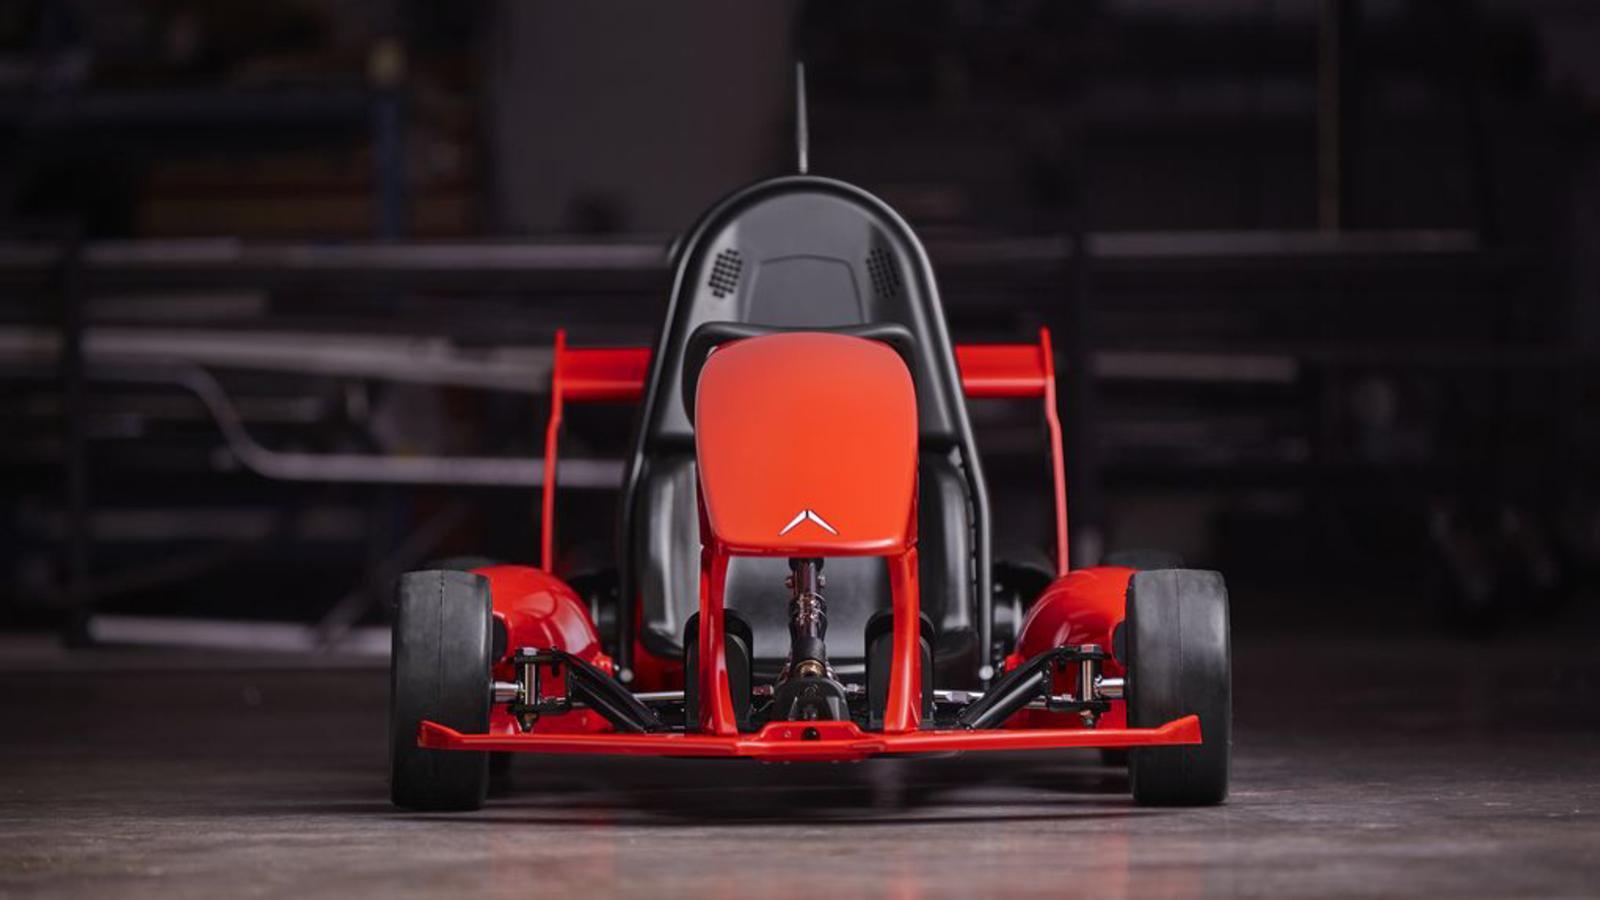 fast furious junior world s first smart kart 39 for kids driving plugin. Black Bedroom Furniture Sets. Home Design Ideas